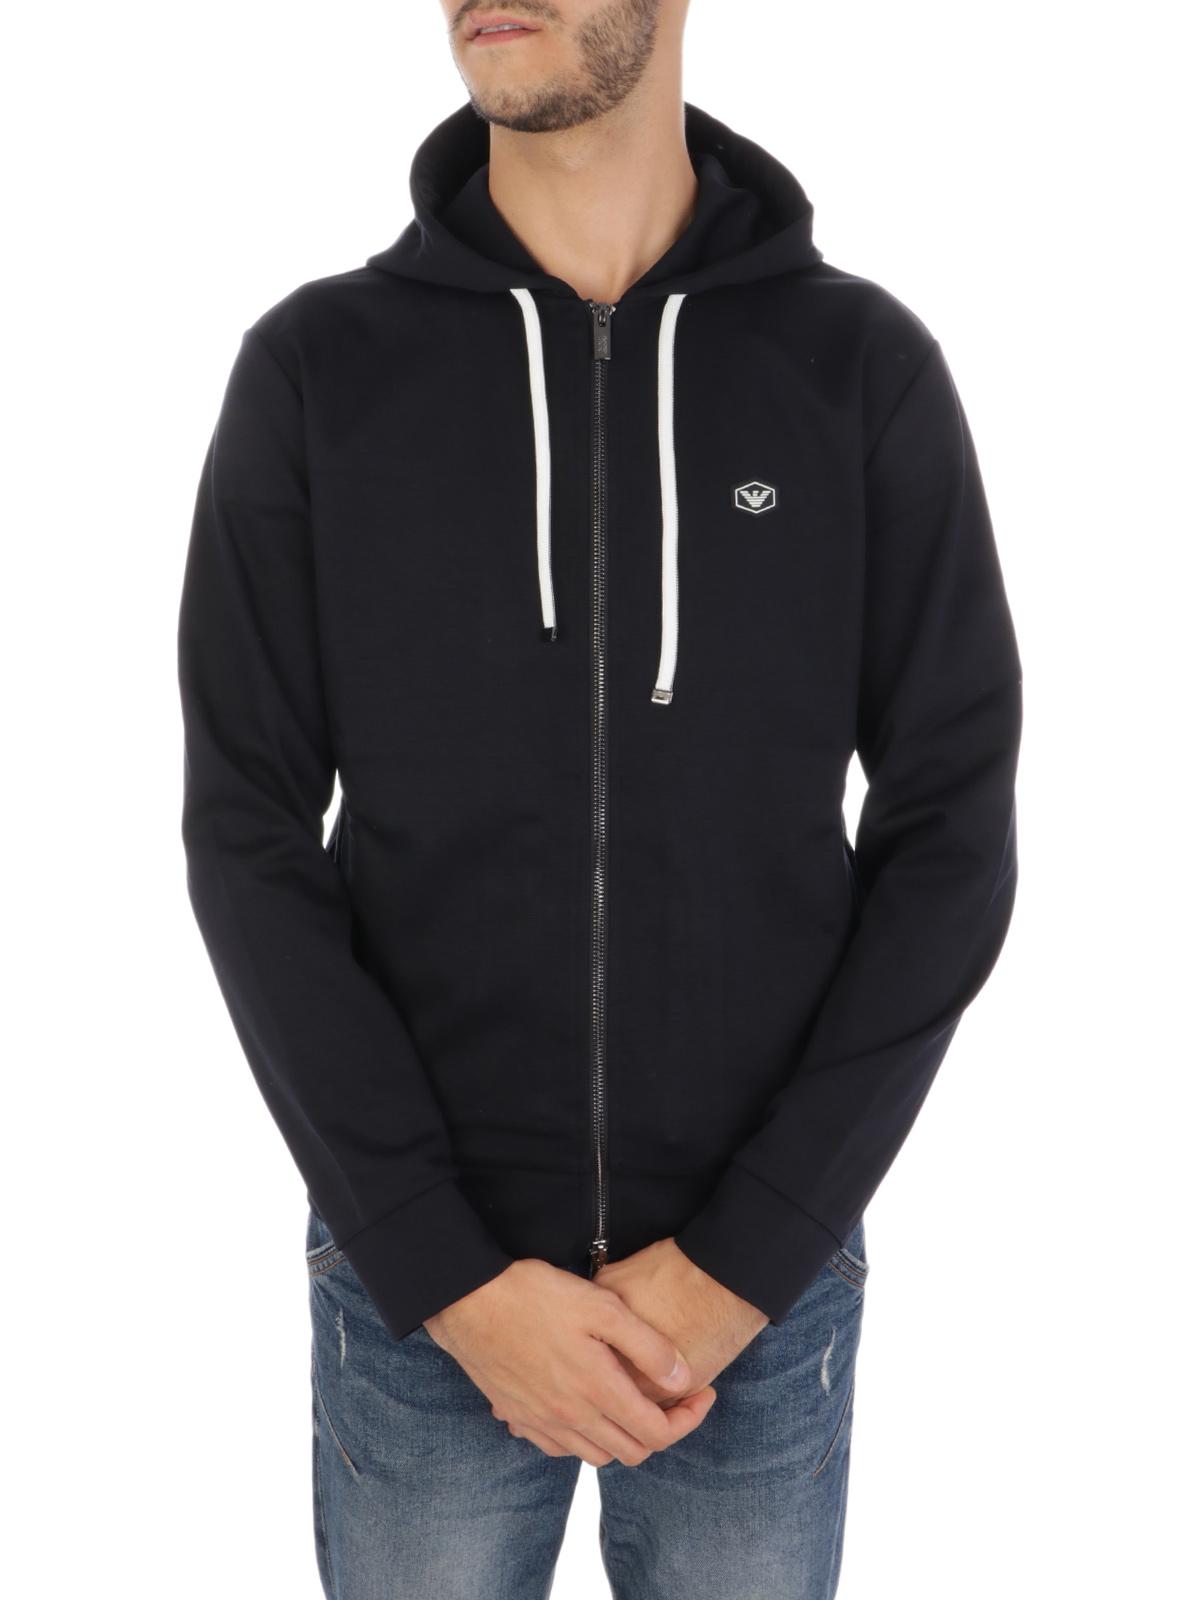 Picture of EMPORIO ARMANI | Men's Cotton Hooded Sweatshirt